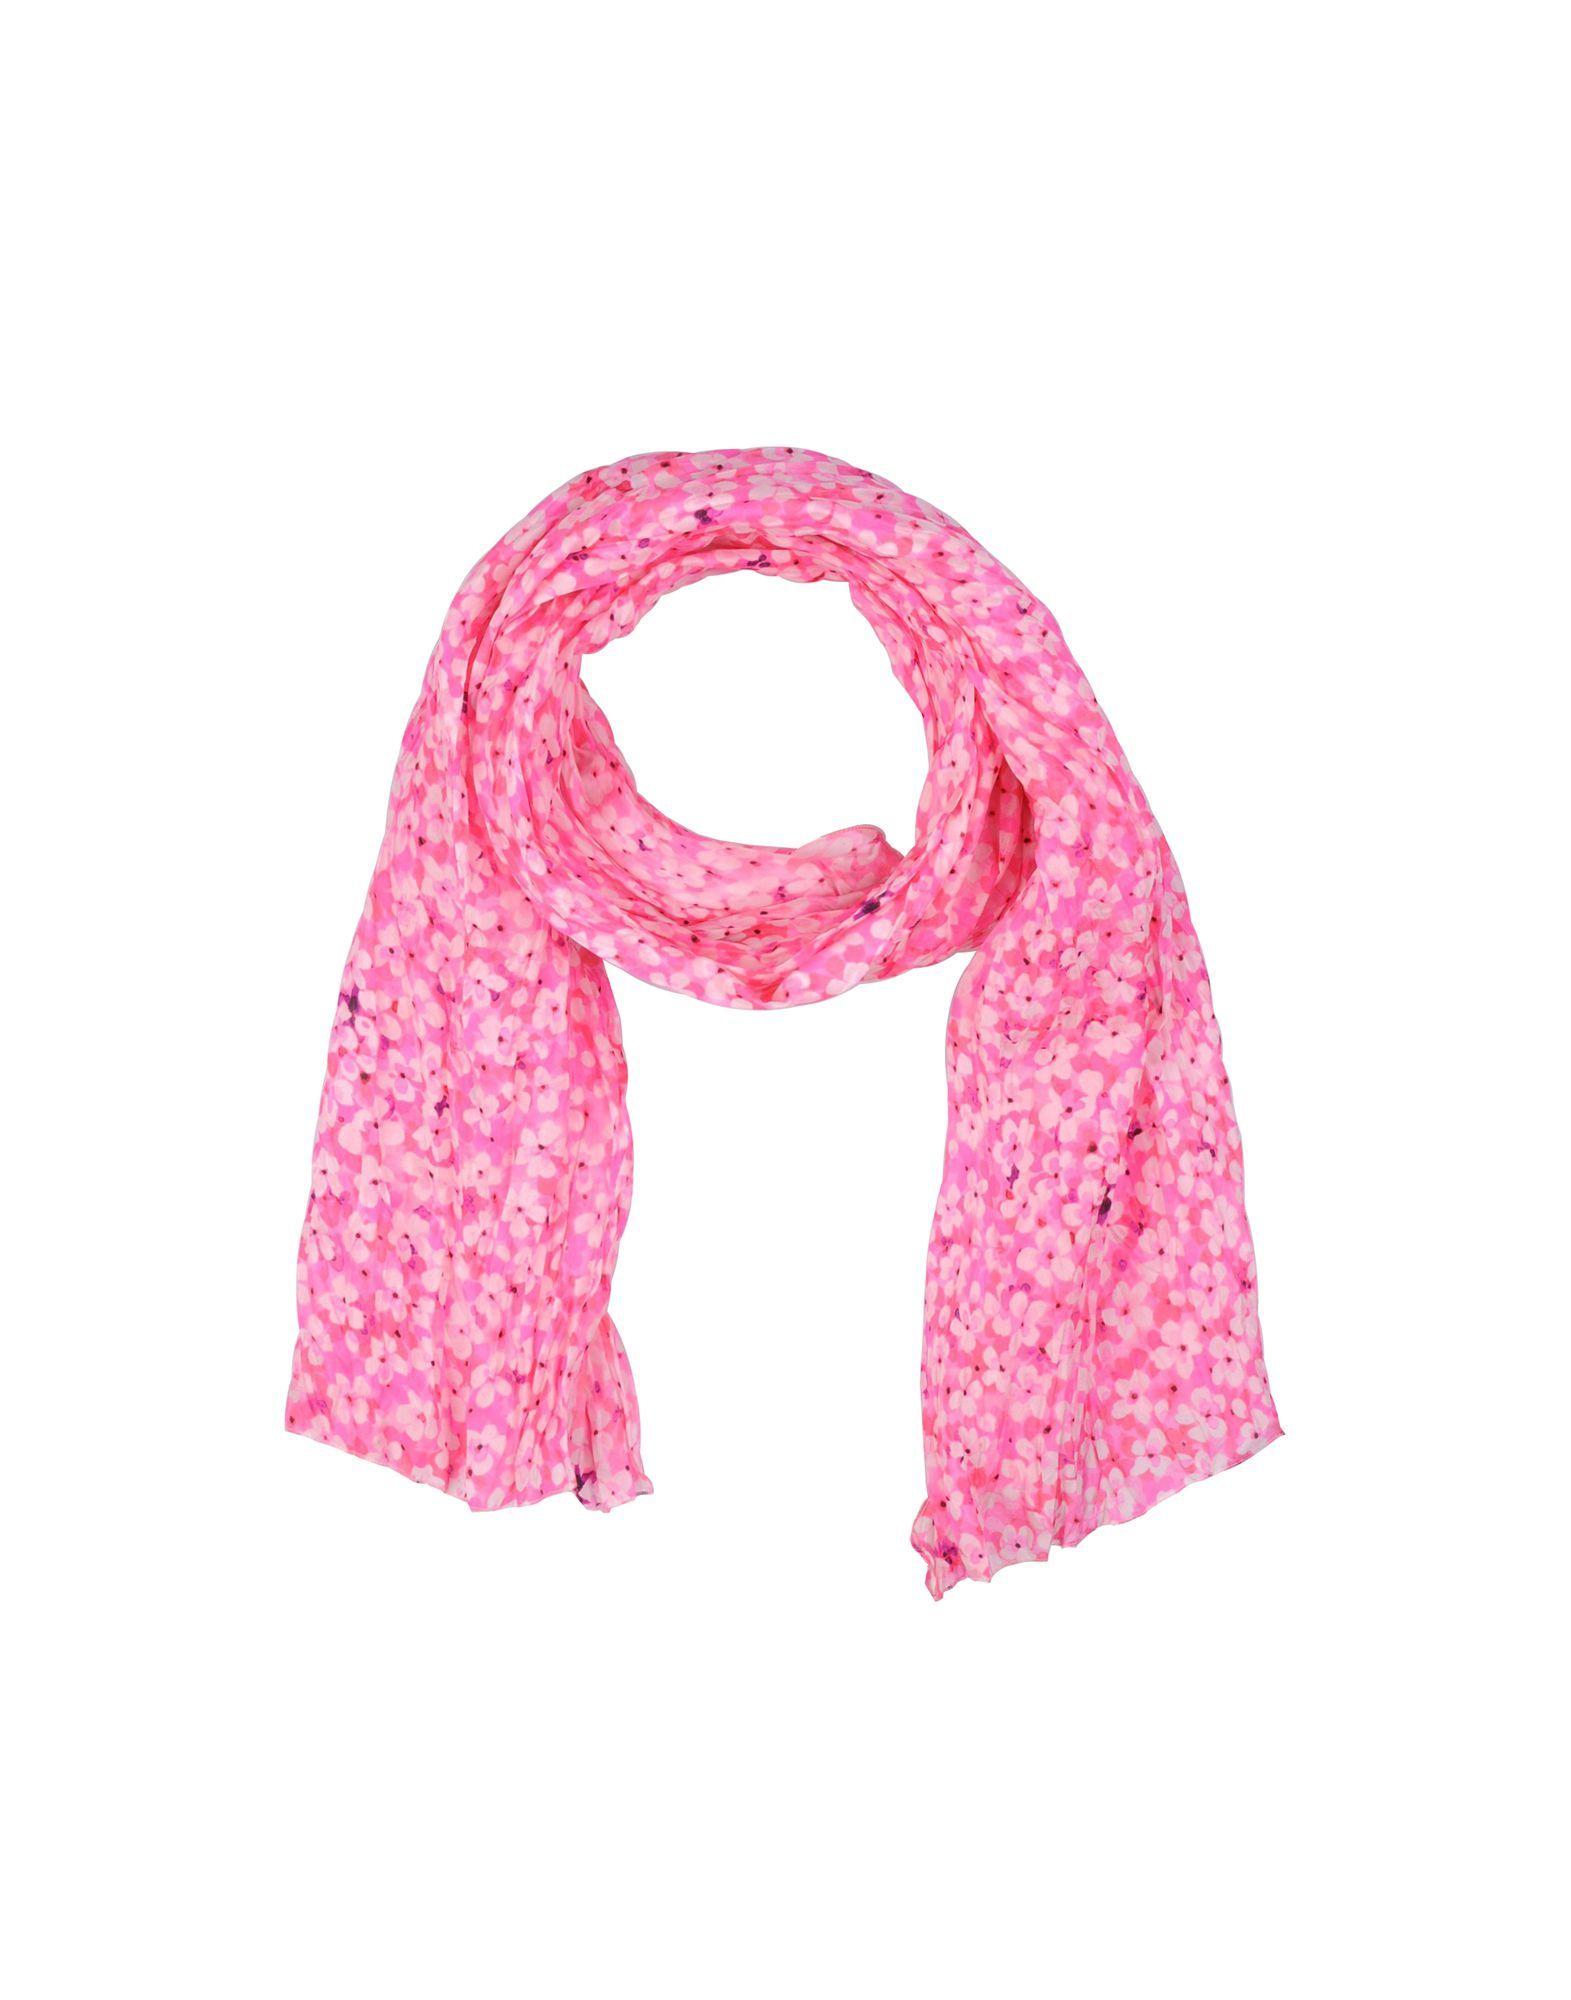 Oblong scarf - Blumarine